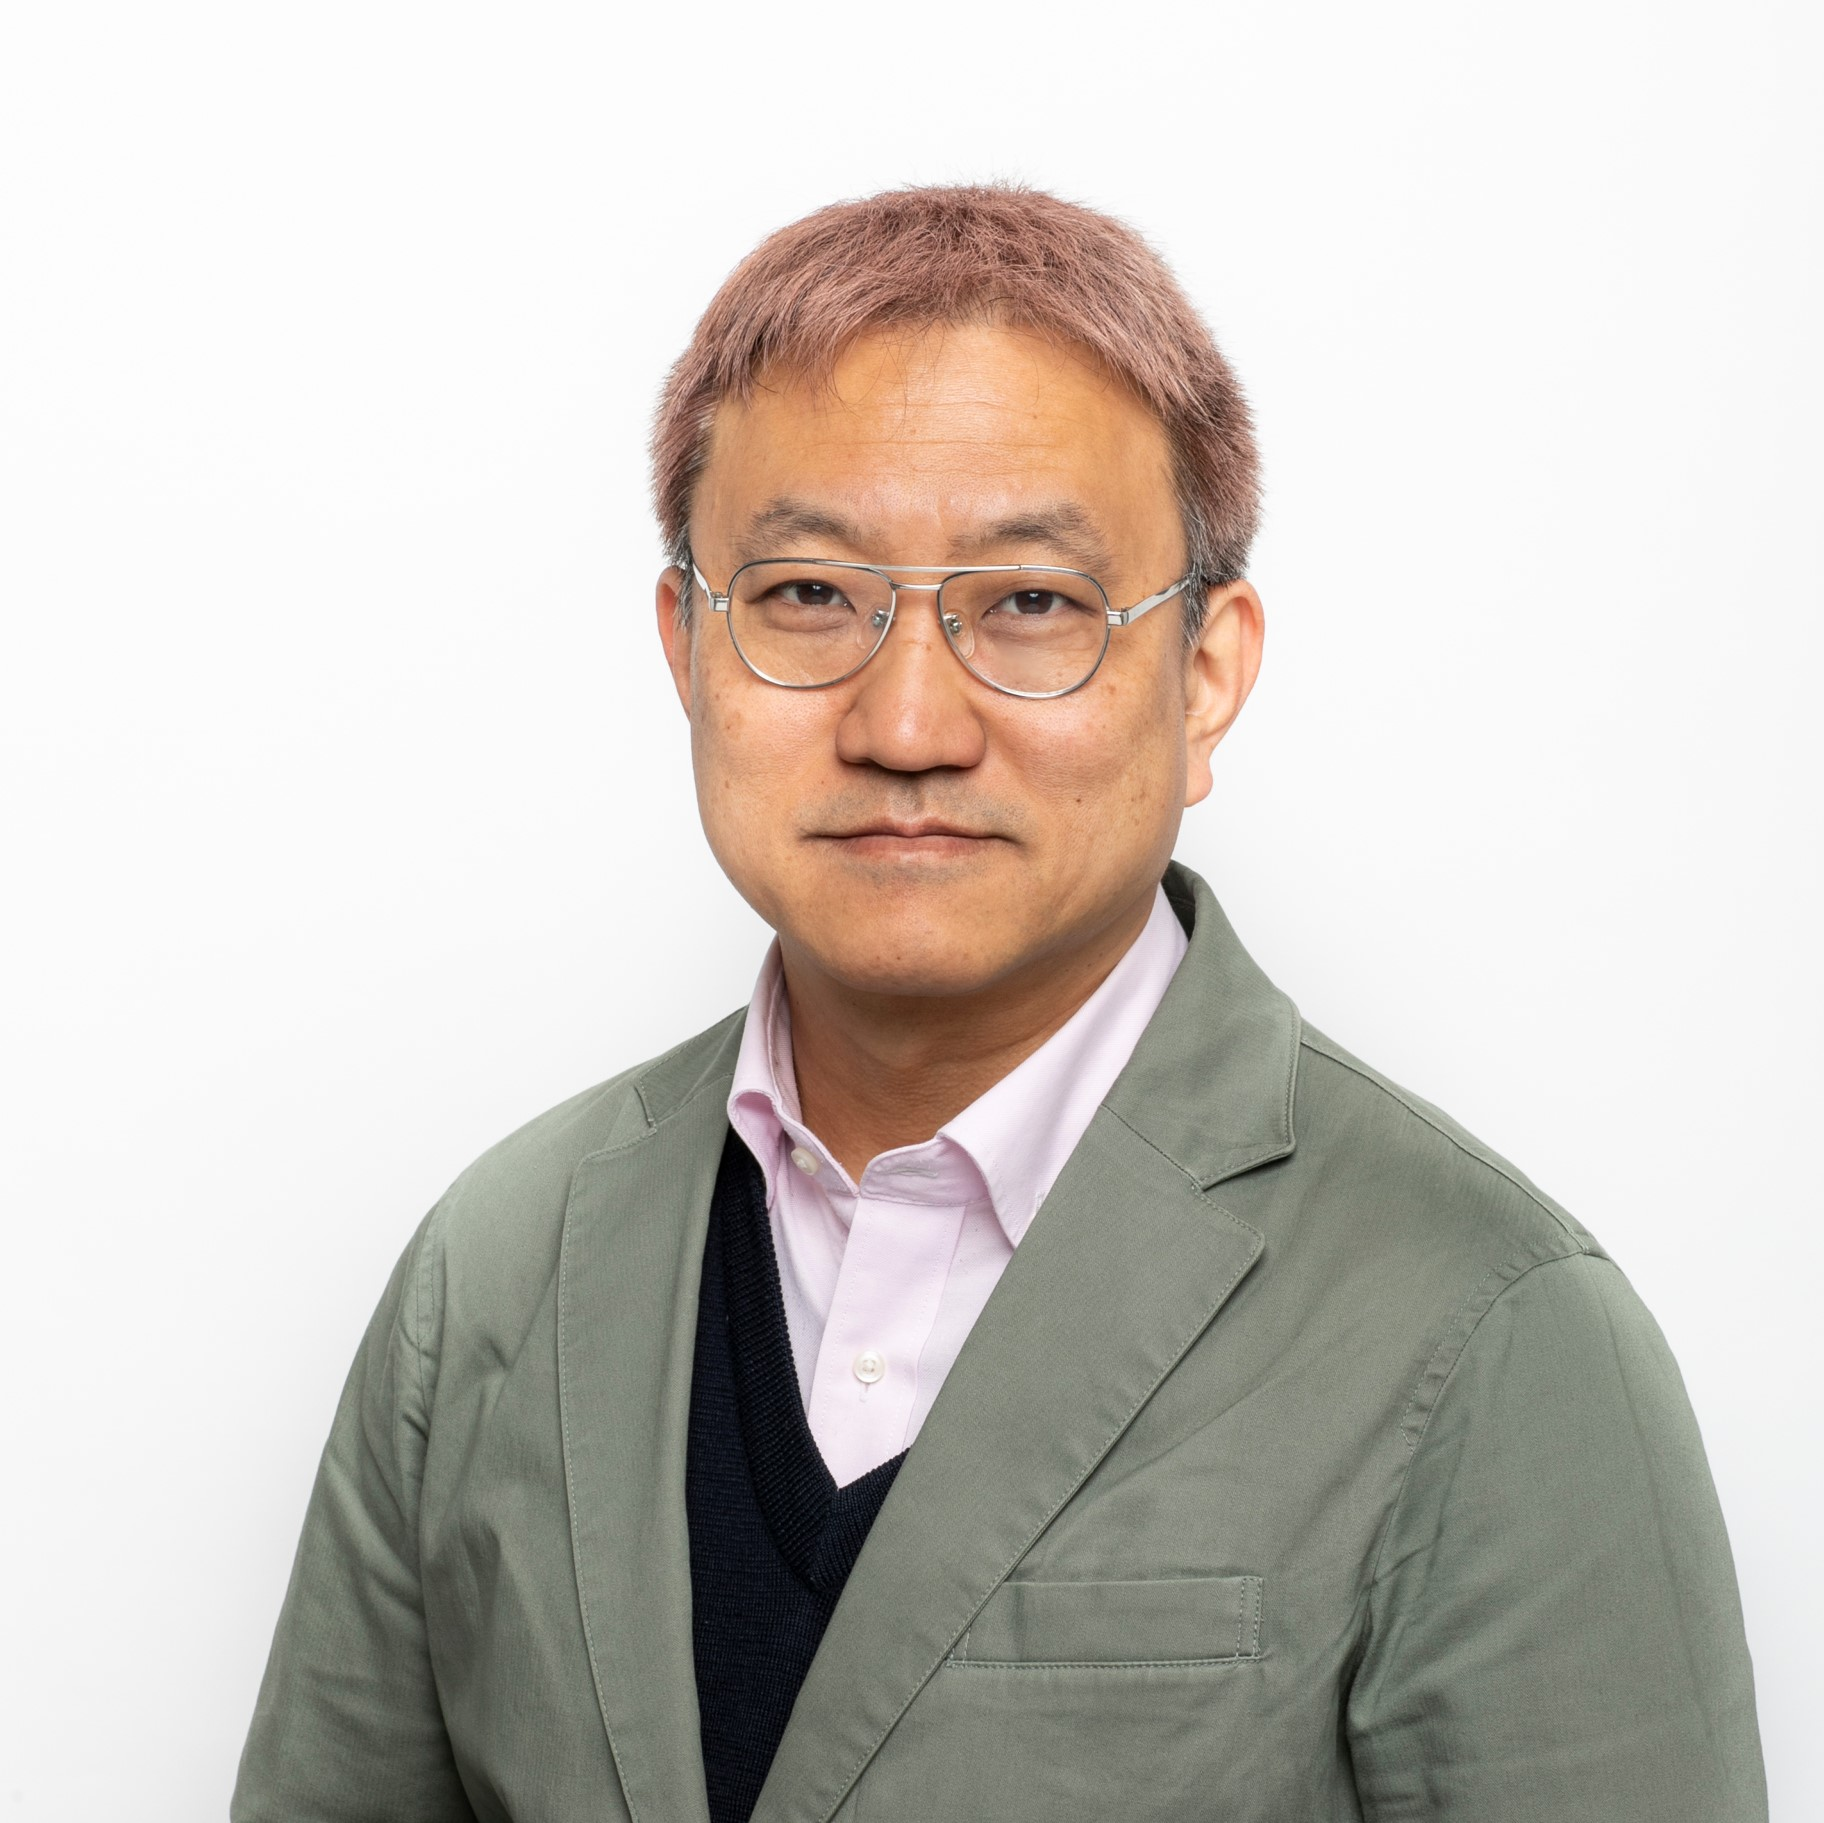 Masanori Sakamoto